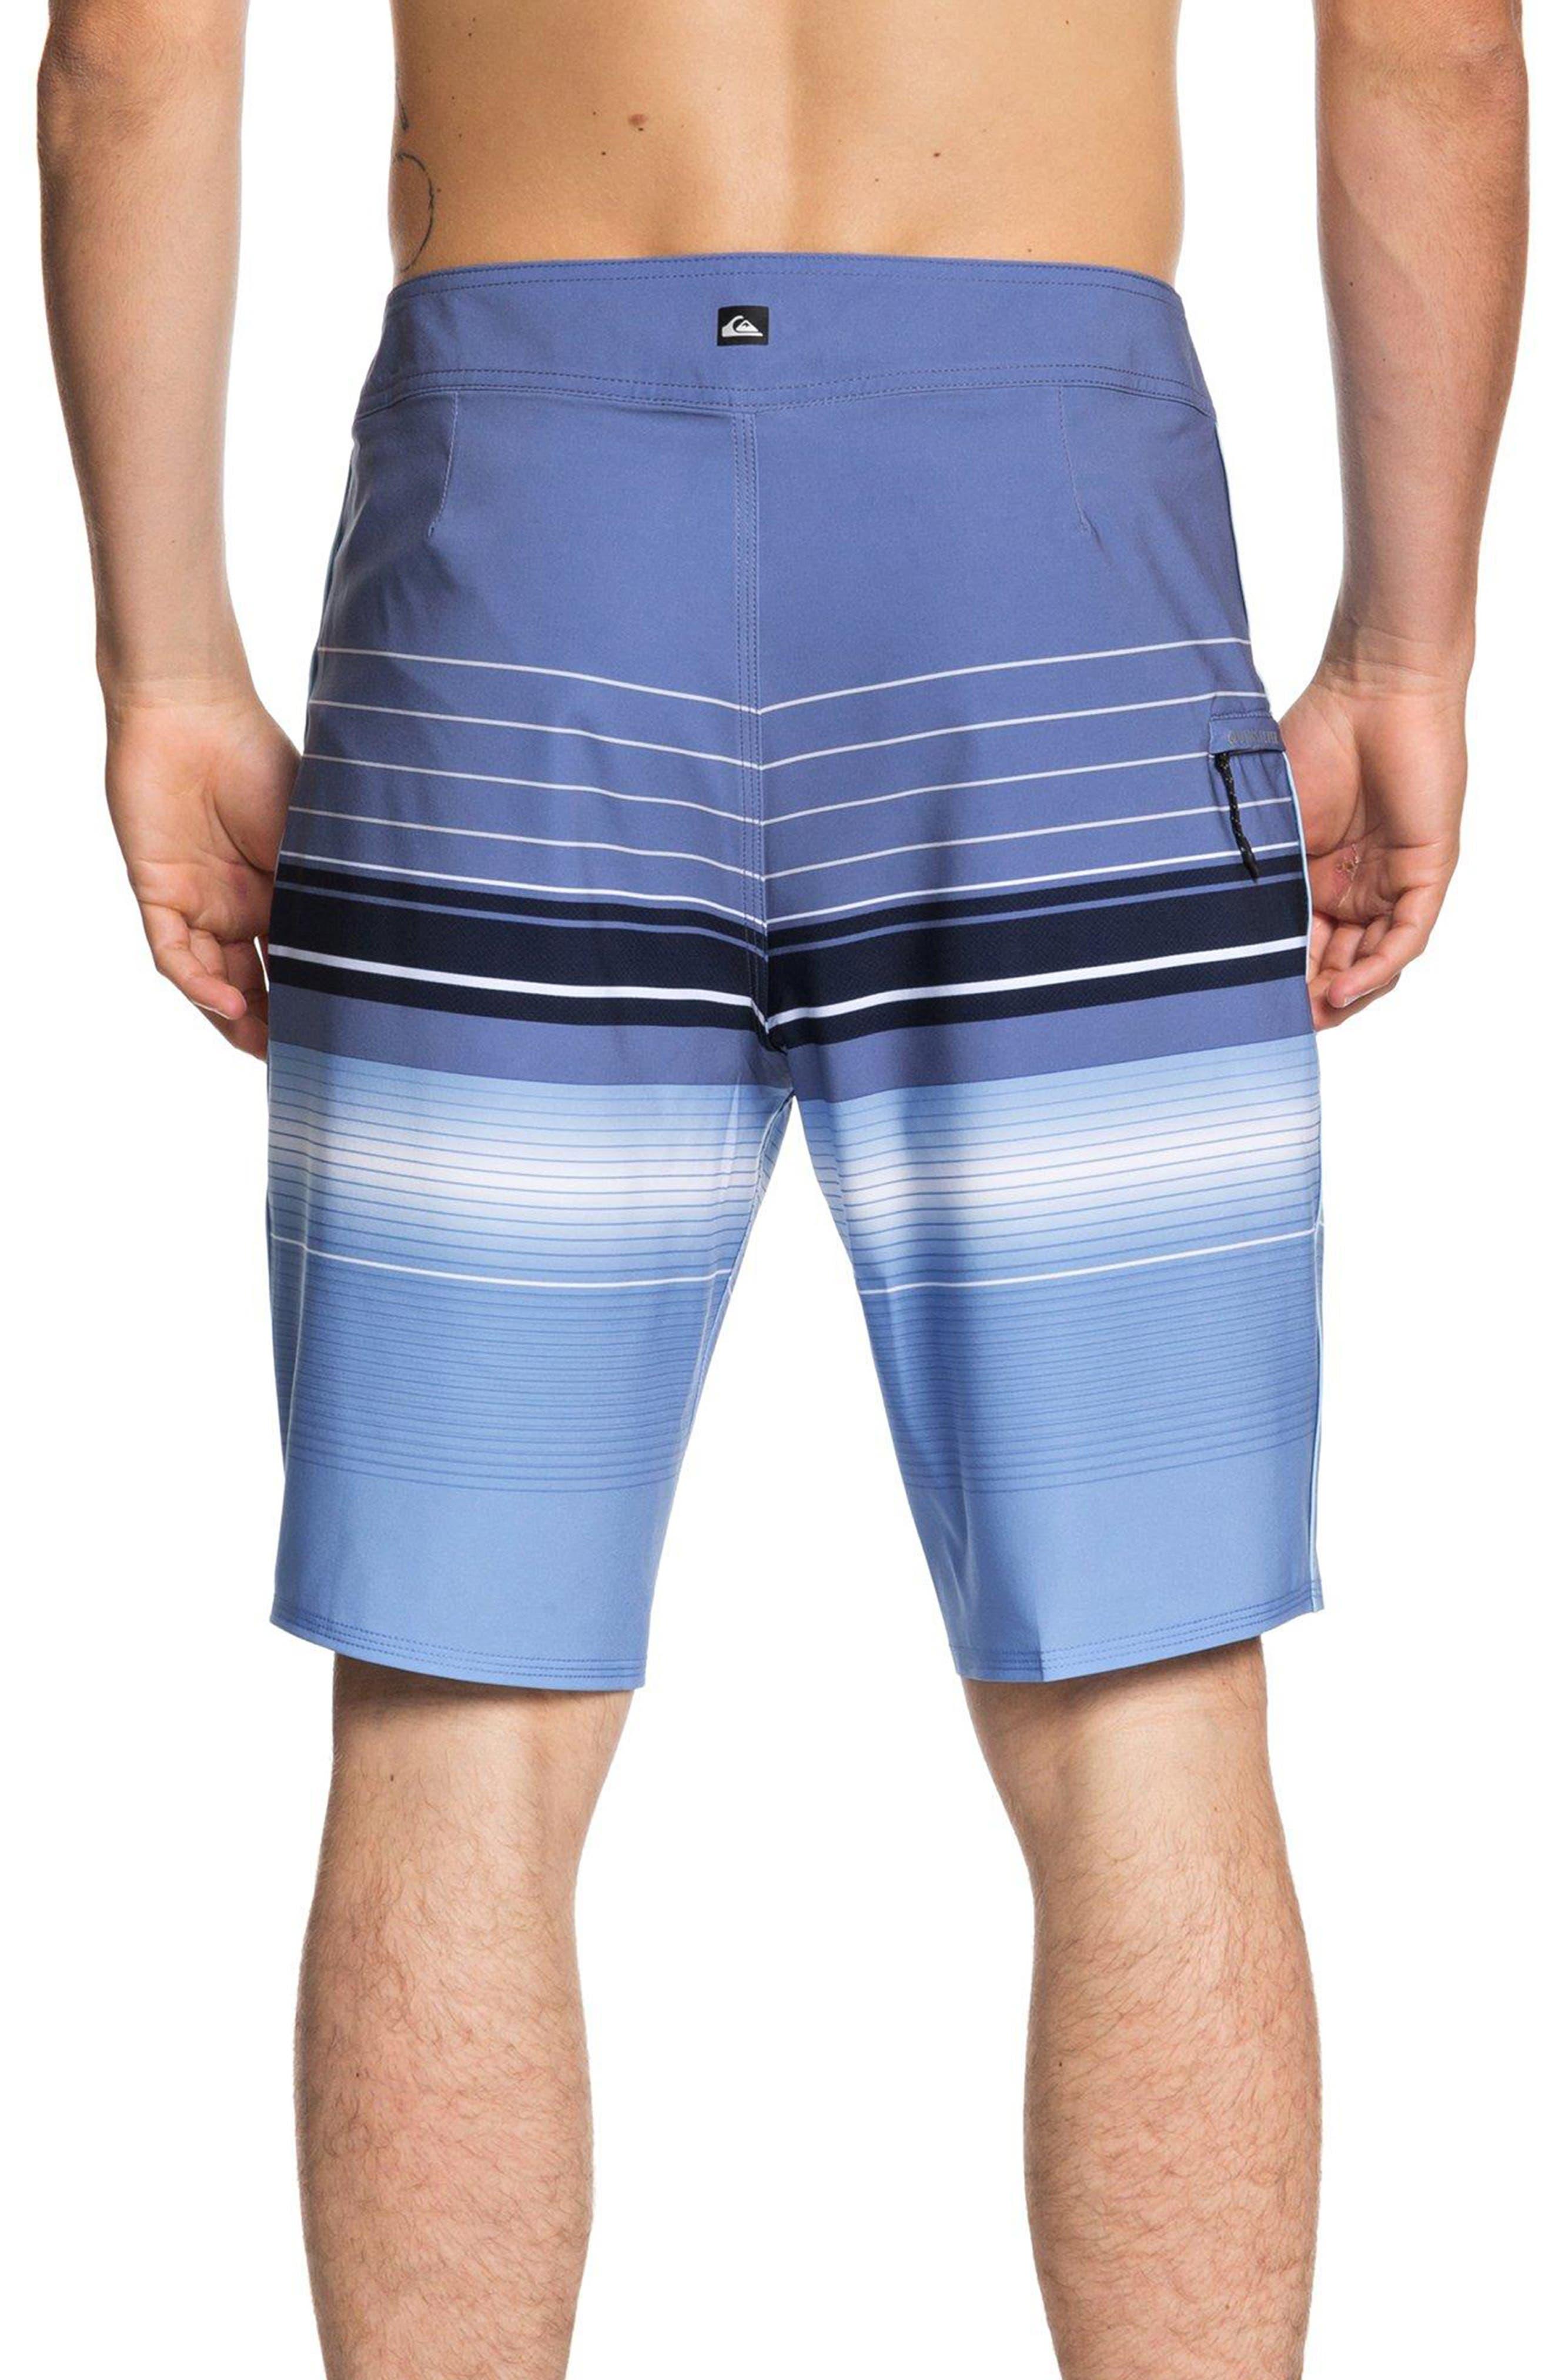 Highline Swell Vision Board Shorts,                             Alternate thumbnail 2, color,                             BIJOU BLUE